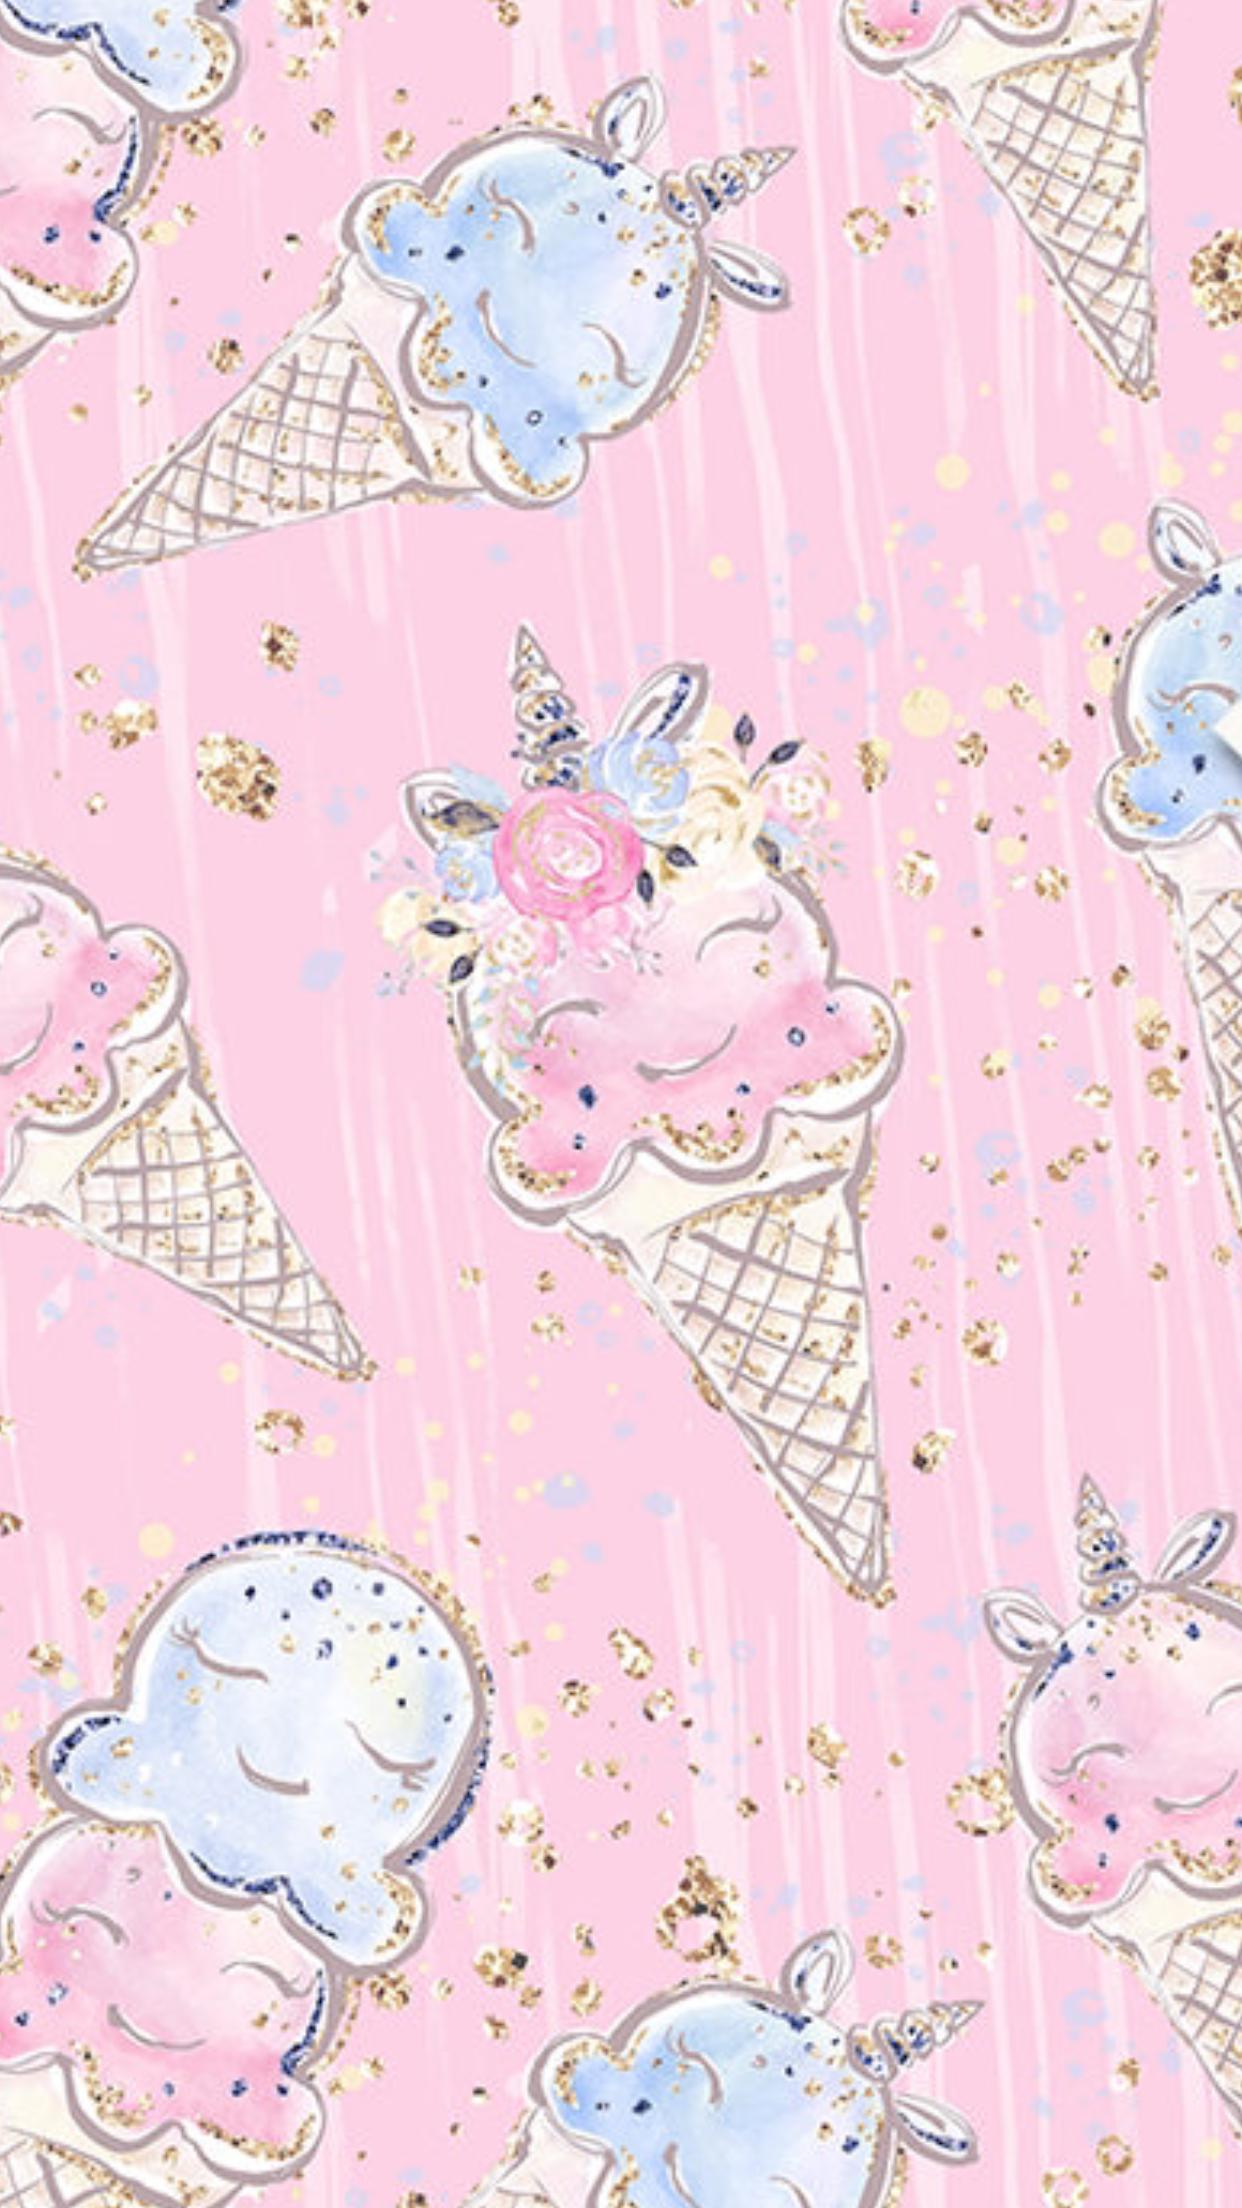 Ice cream Unicorn wallpaper, Cute wallpapers, Kawaii